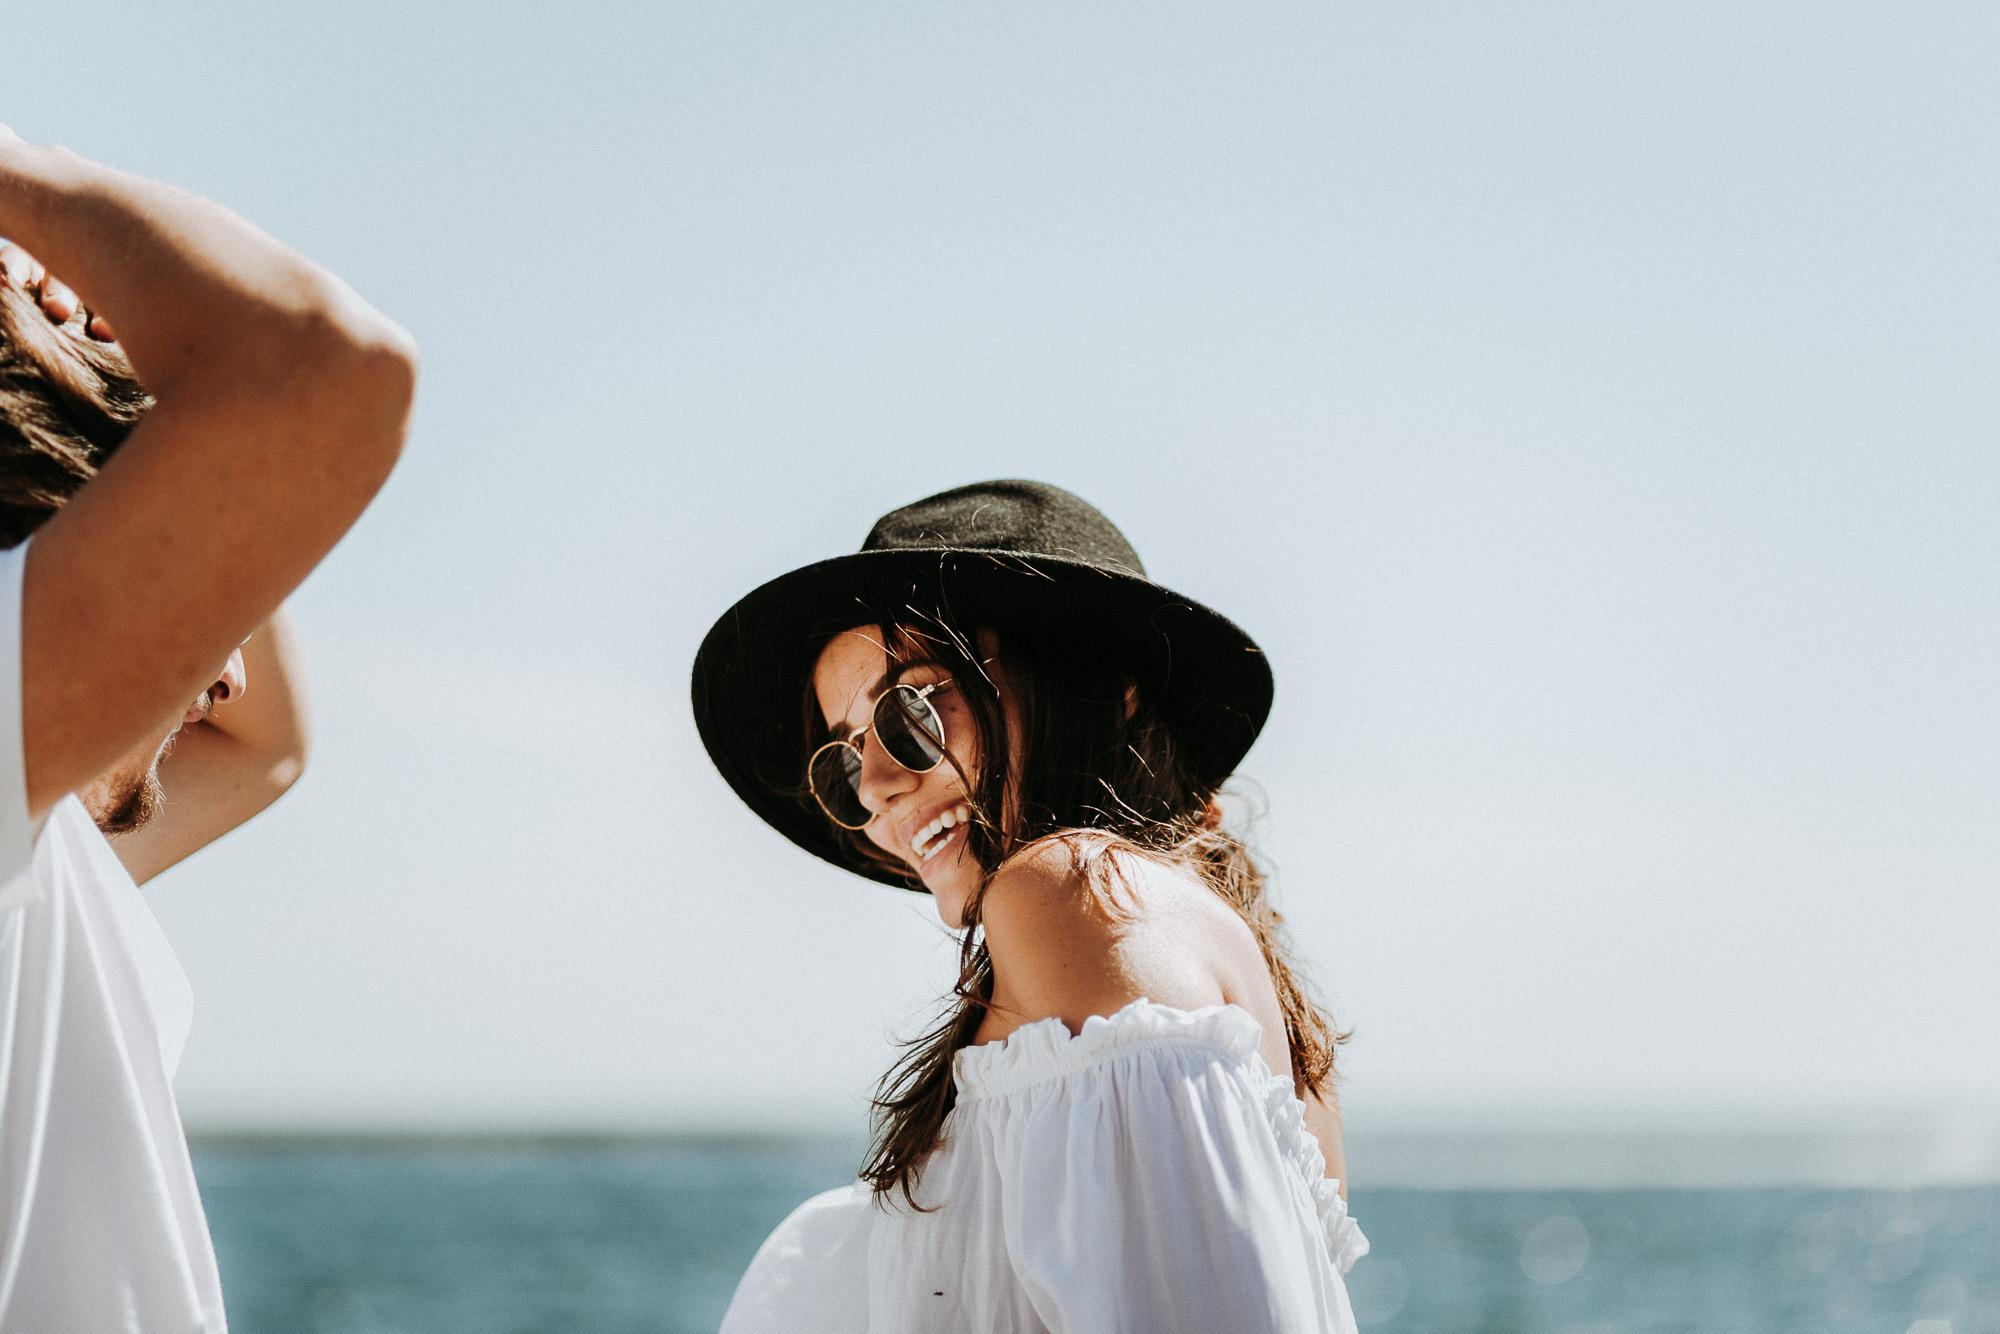 DanielaMarquardtPhotography_wedding_elopement_mallorca_spain_stjordi_sessalines_marinaandxavi76